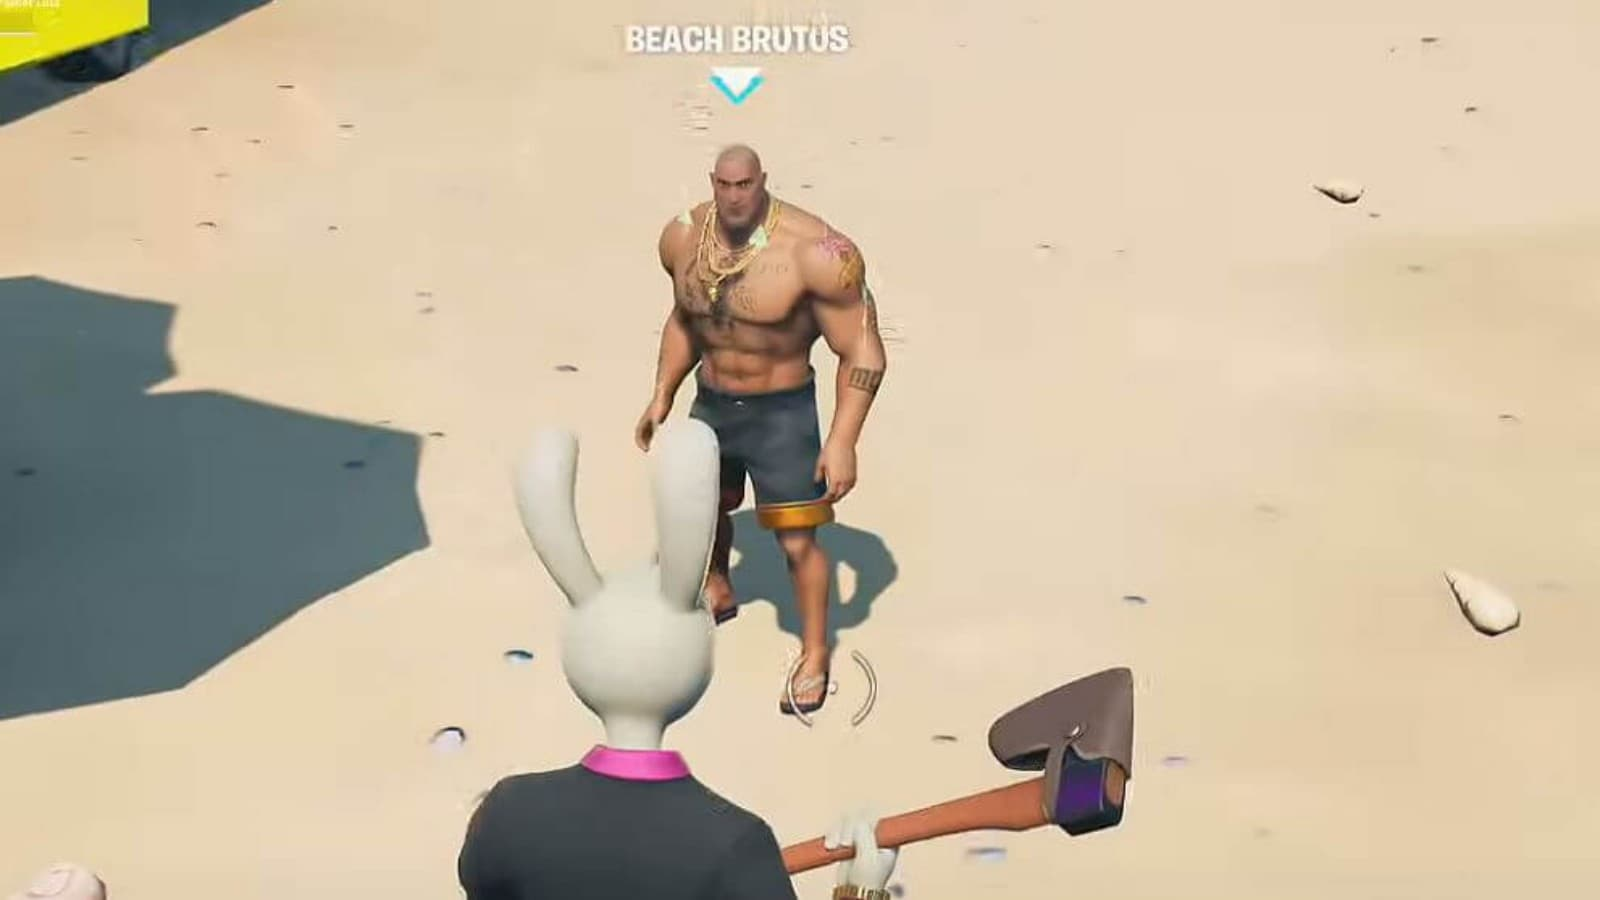 New Fortnite Brutus Skin in Season 7: How to Get It